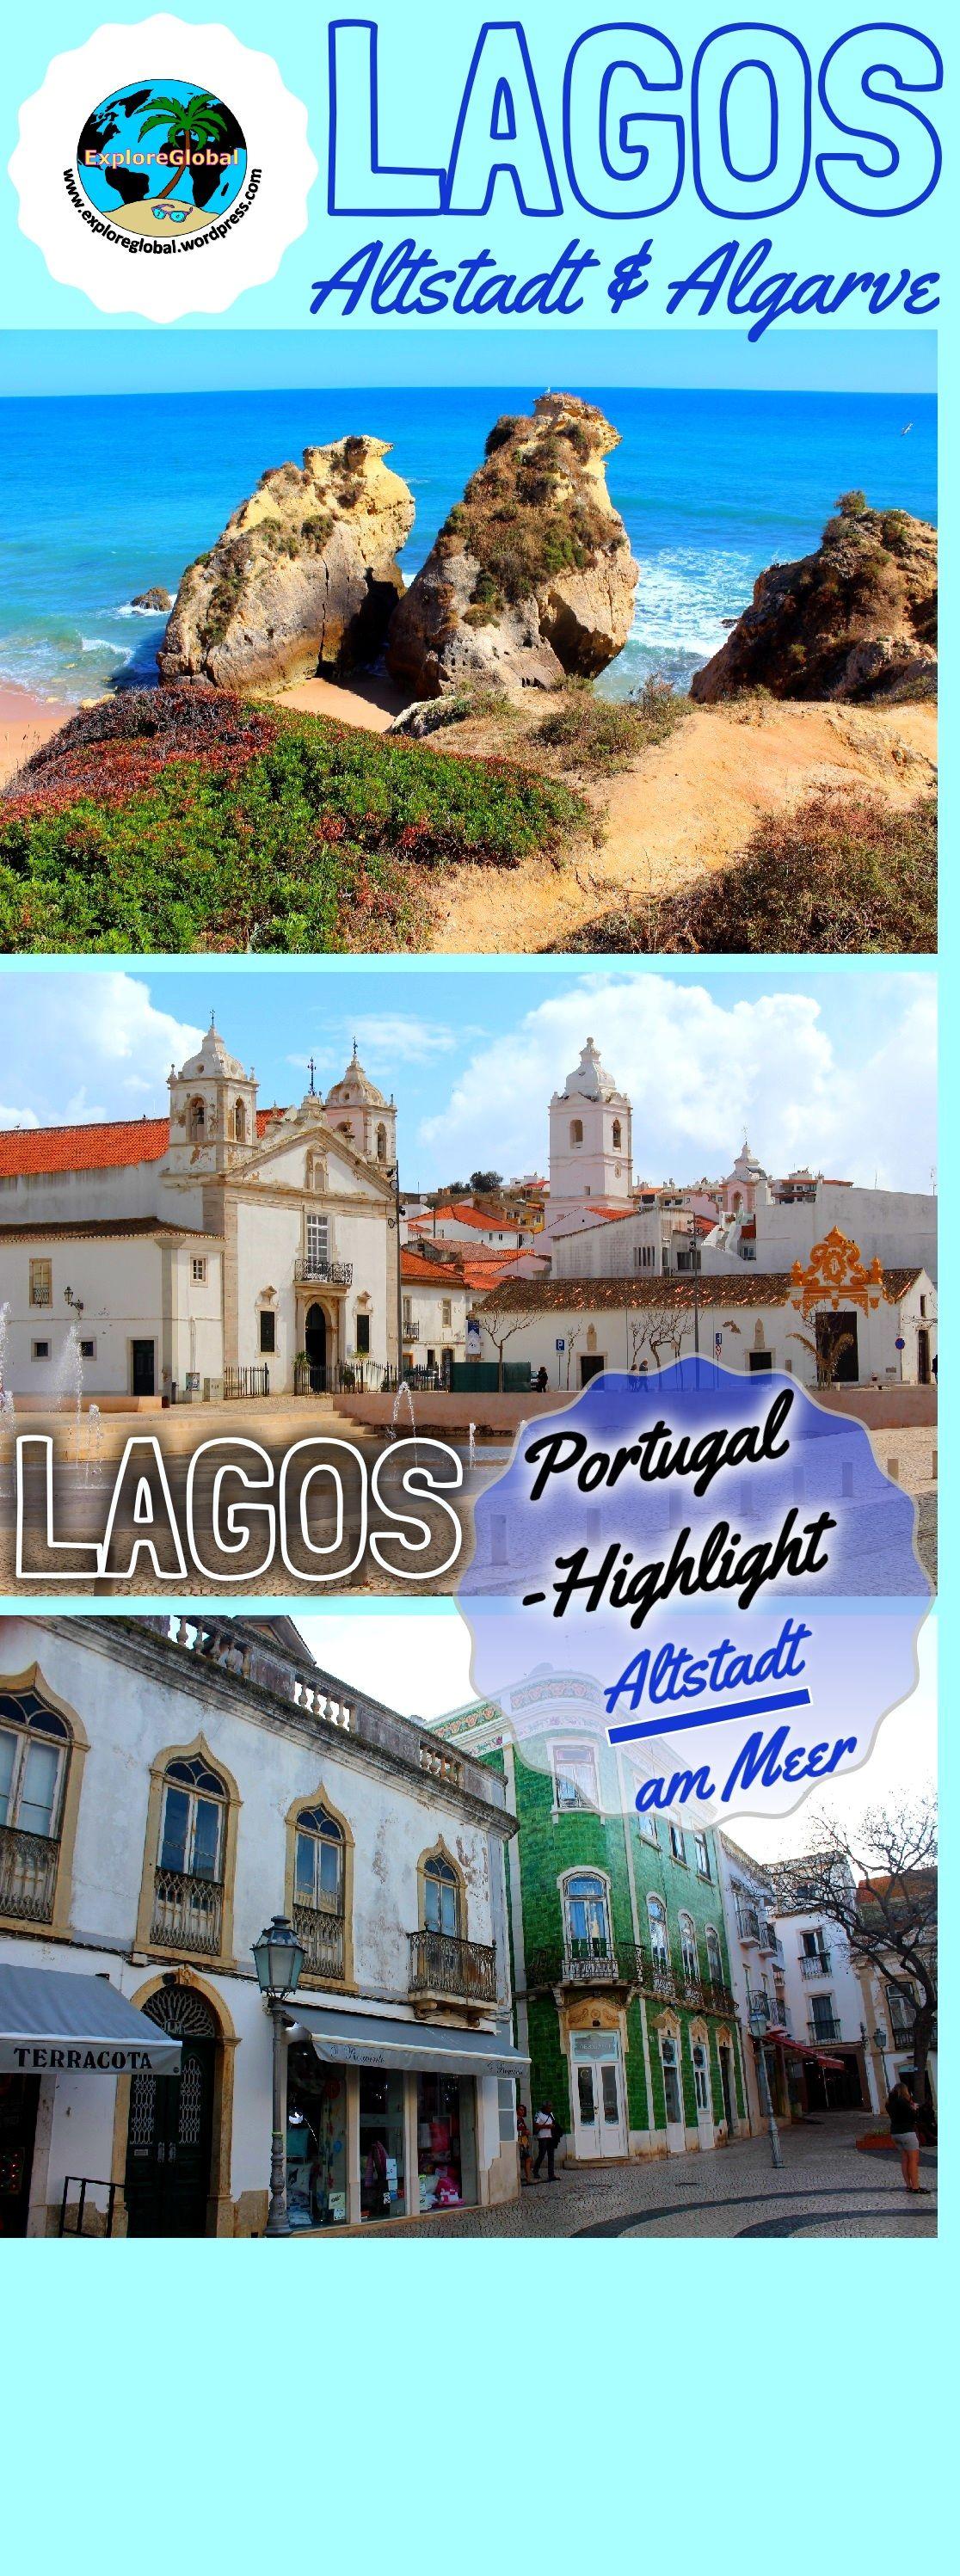 Lagos: Altstadt-Traum am Meer in Portugal. #traveltoportugal